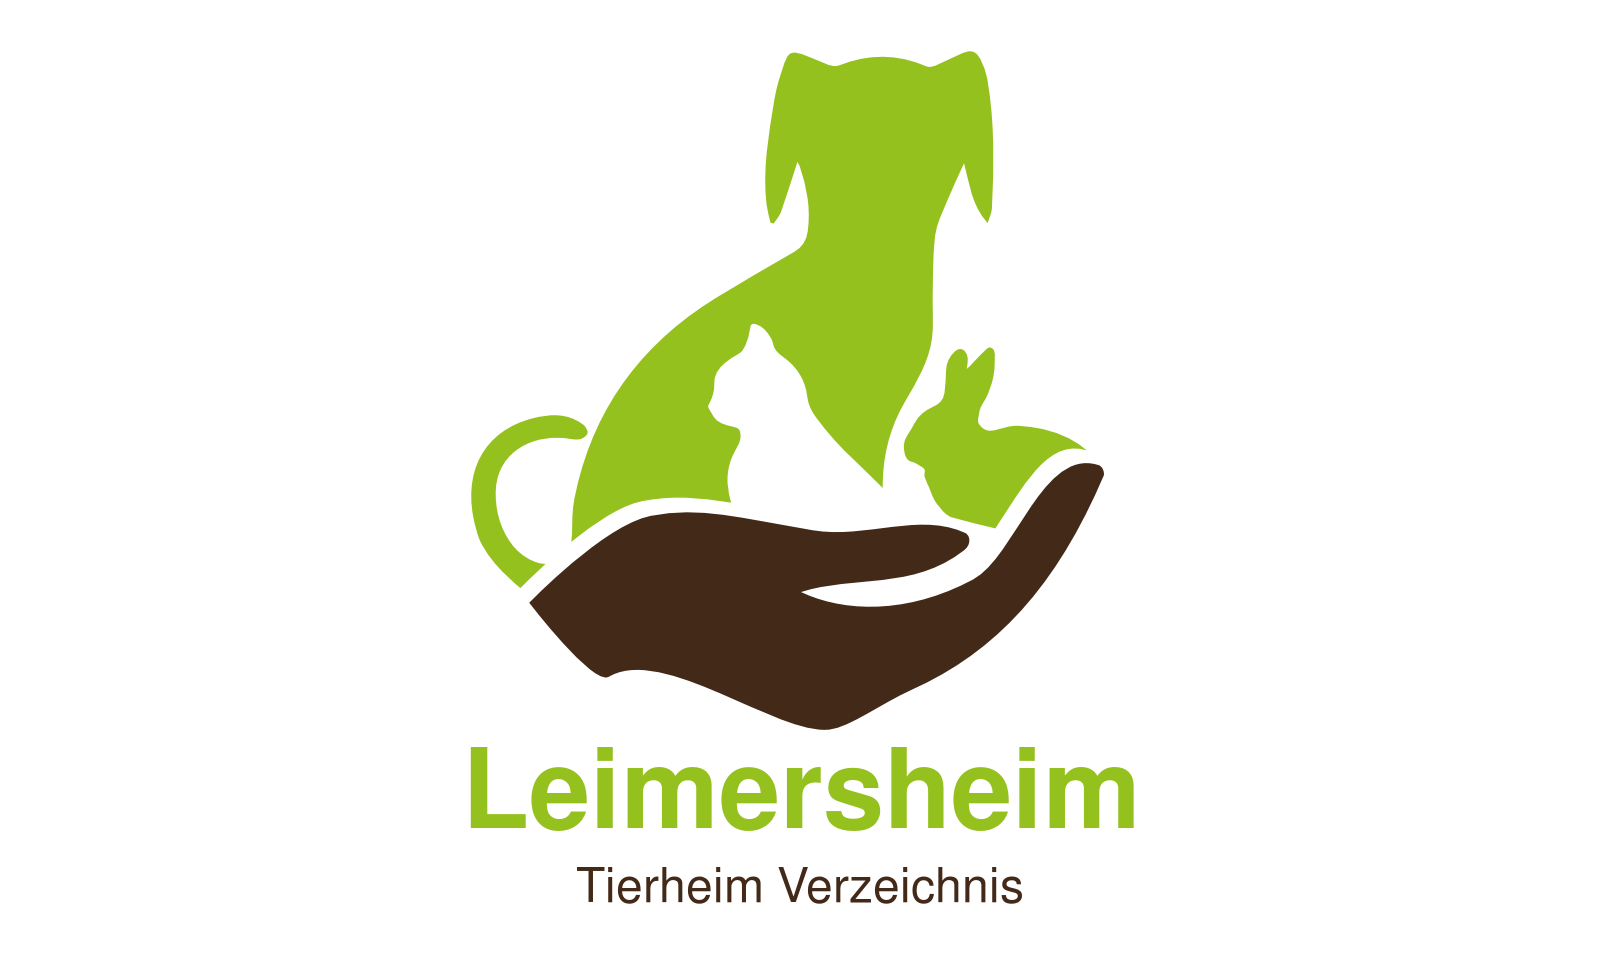 Tierheim Leimersheim